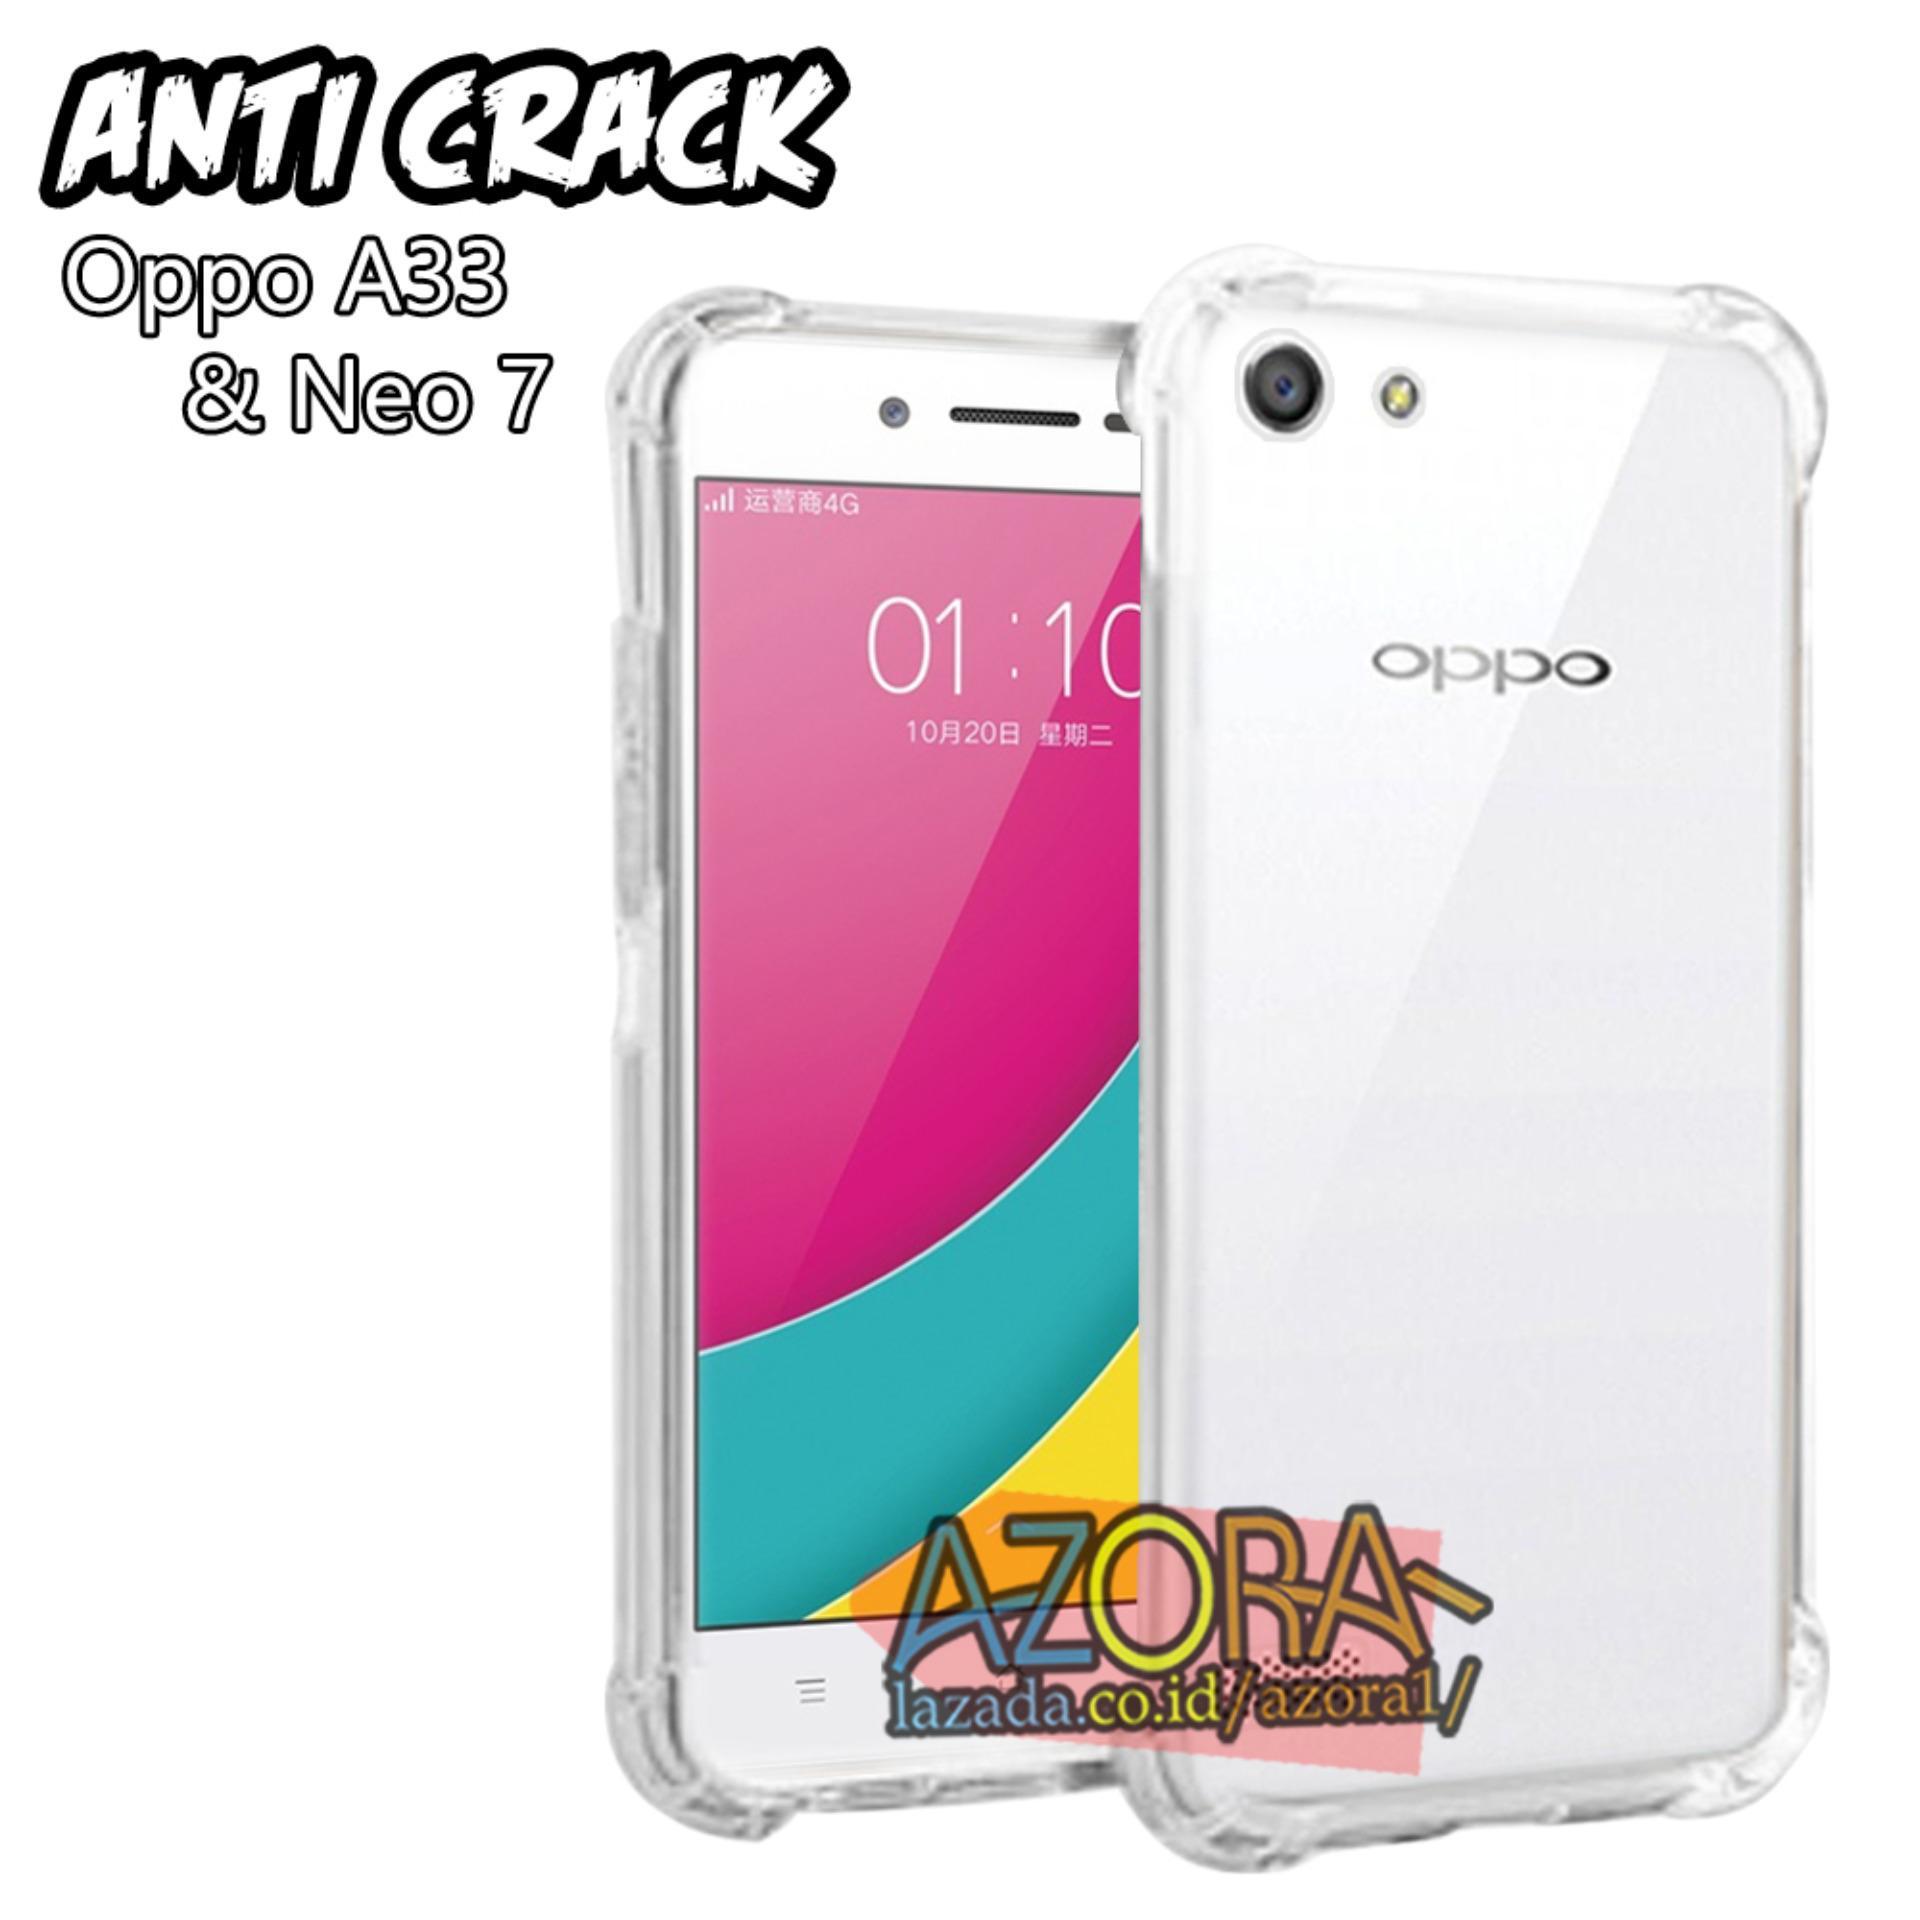 Case Anti Crack Oppo Neo 7 / A33 Ultra Thin Anti Shock Jelly Silikon Shockproof Softcase